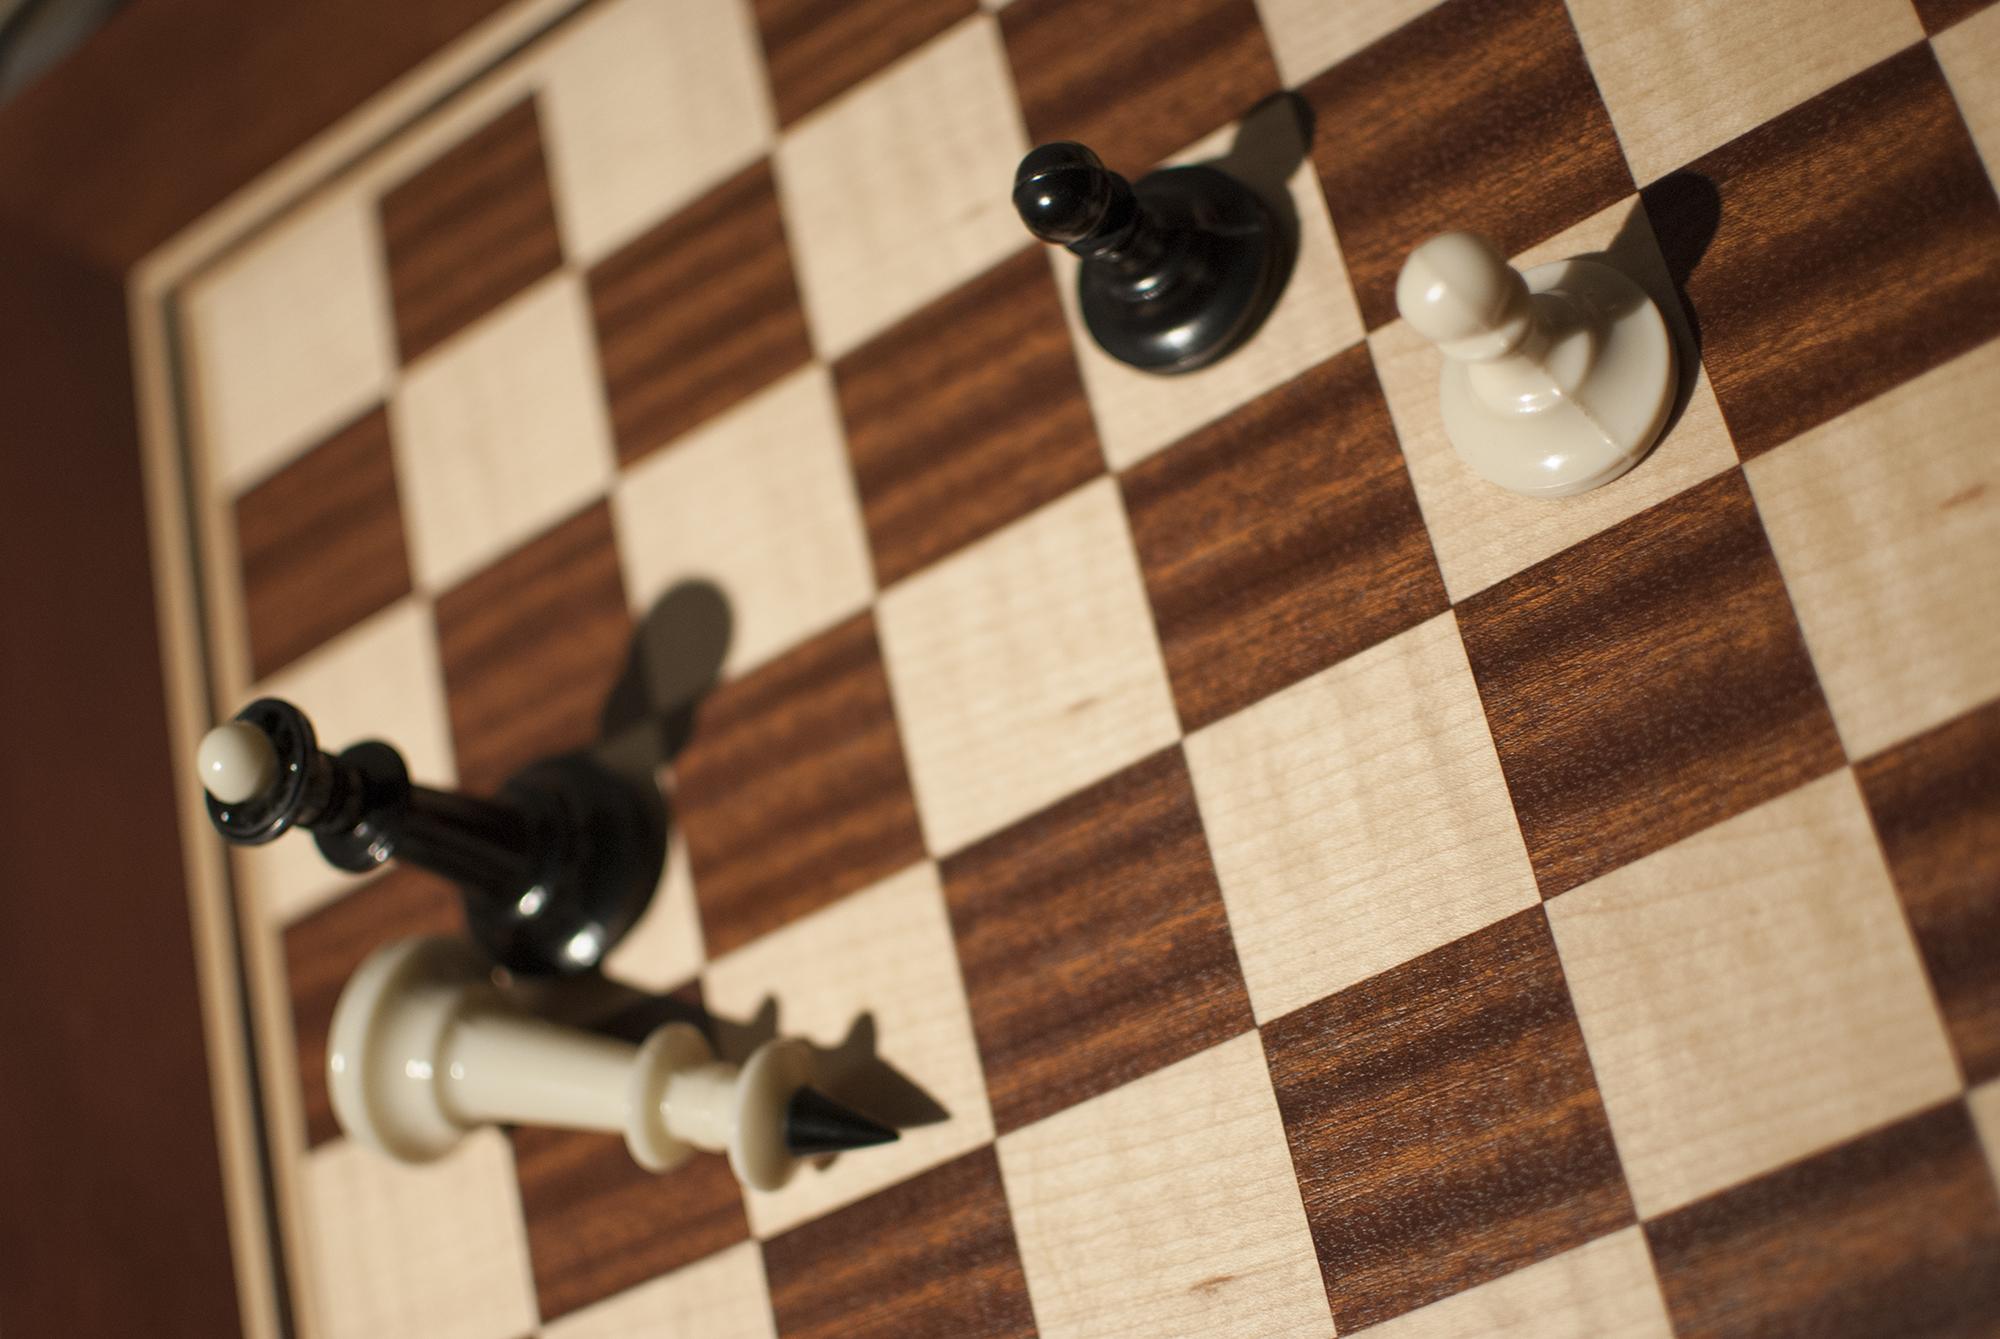 Chess_board_2